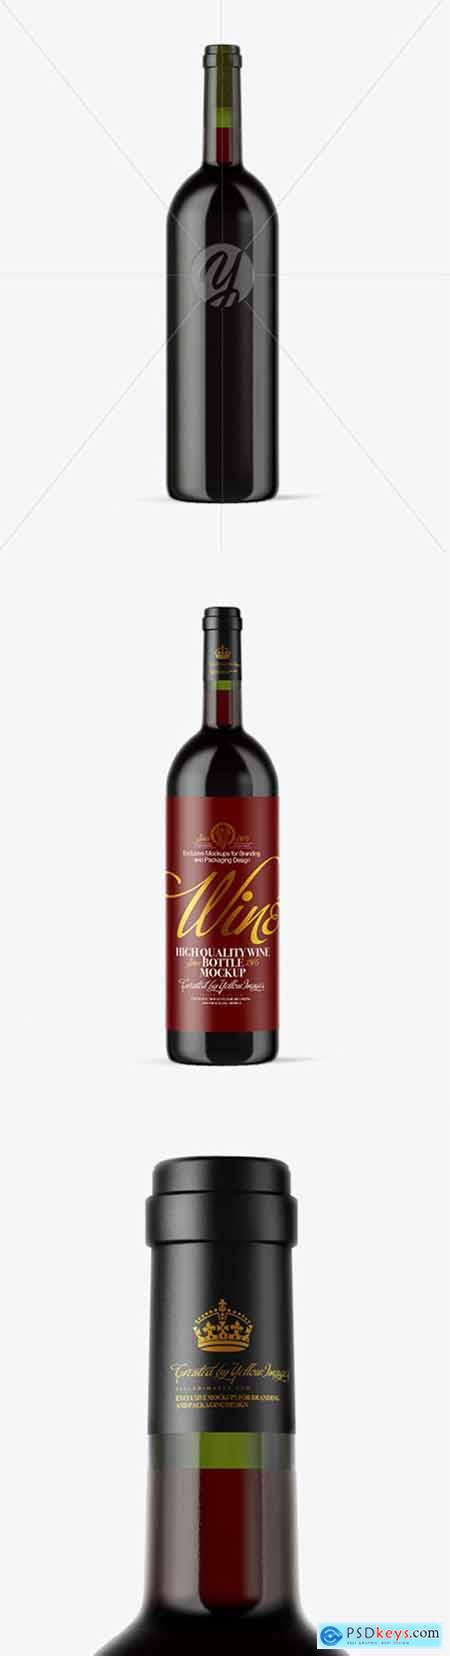 Green Glass Red Wine Bottle Mockup 51886